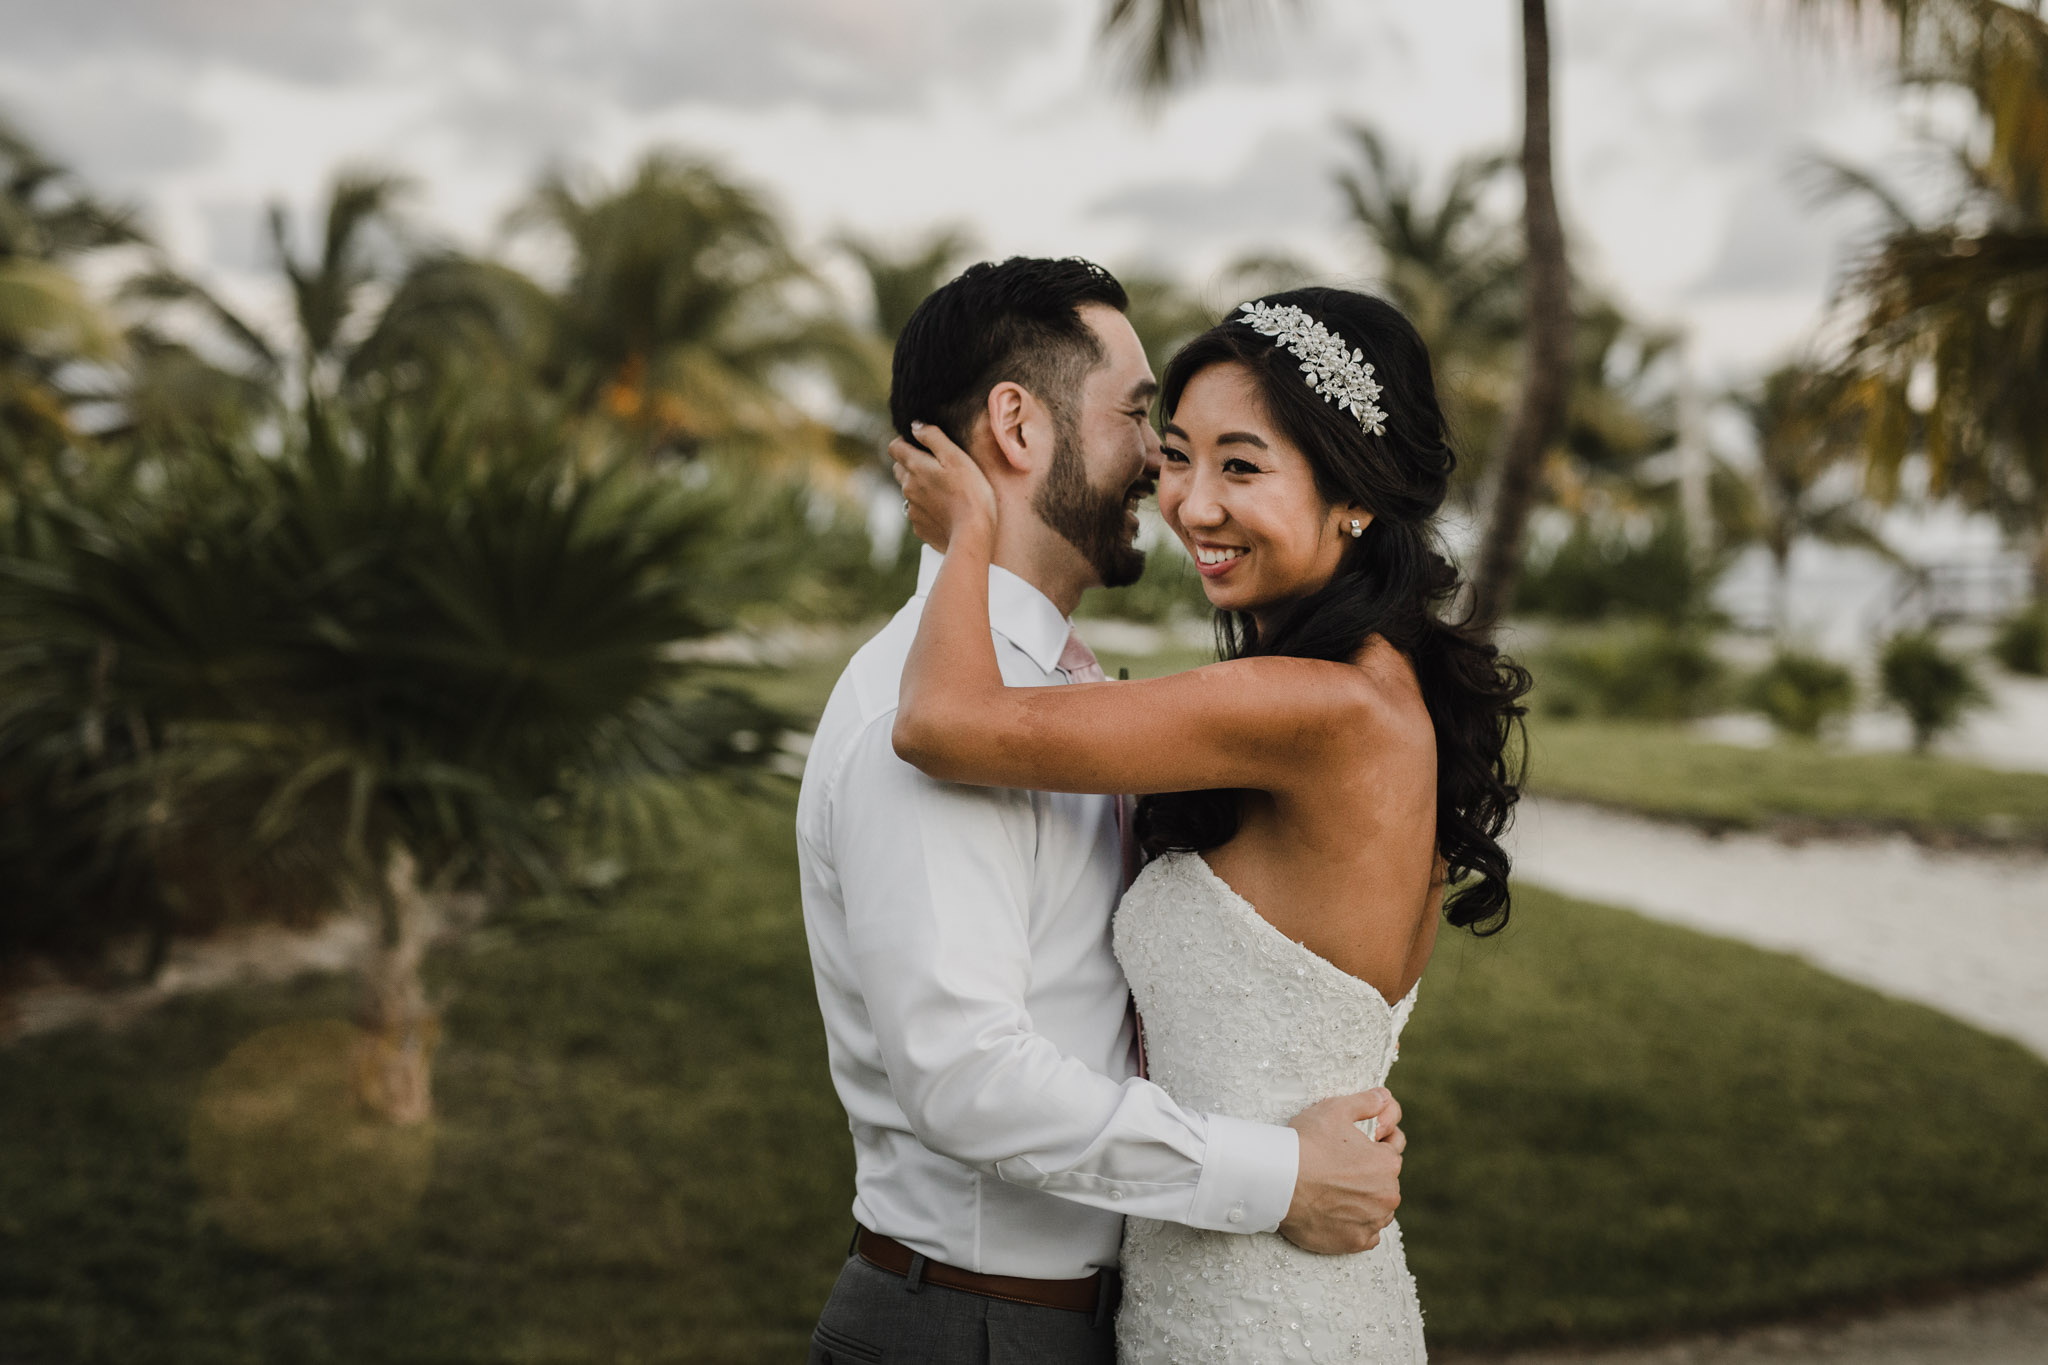 Cancun Mexico Wedding - playful on the beach